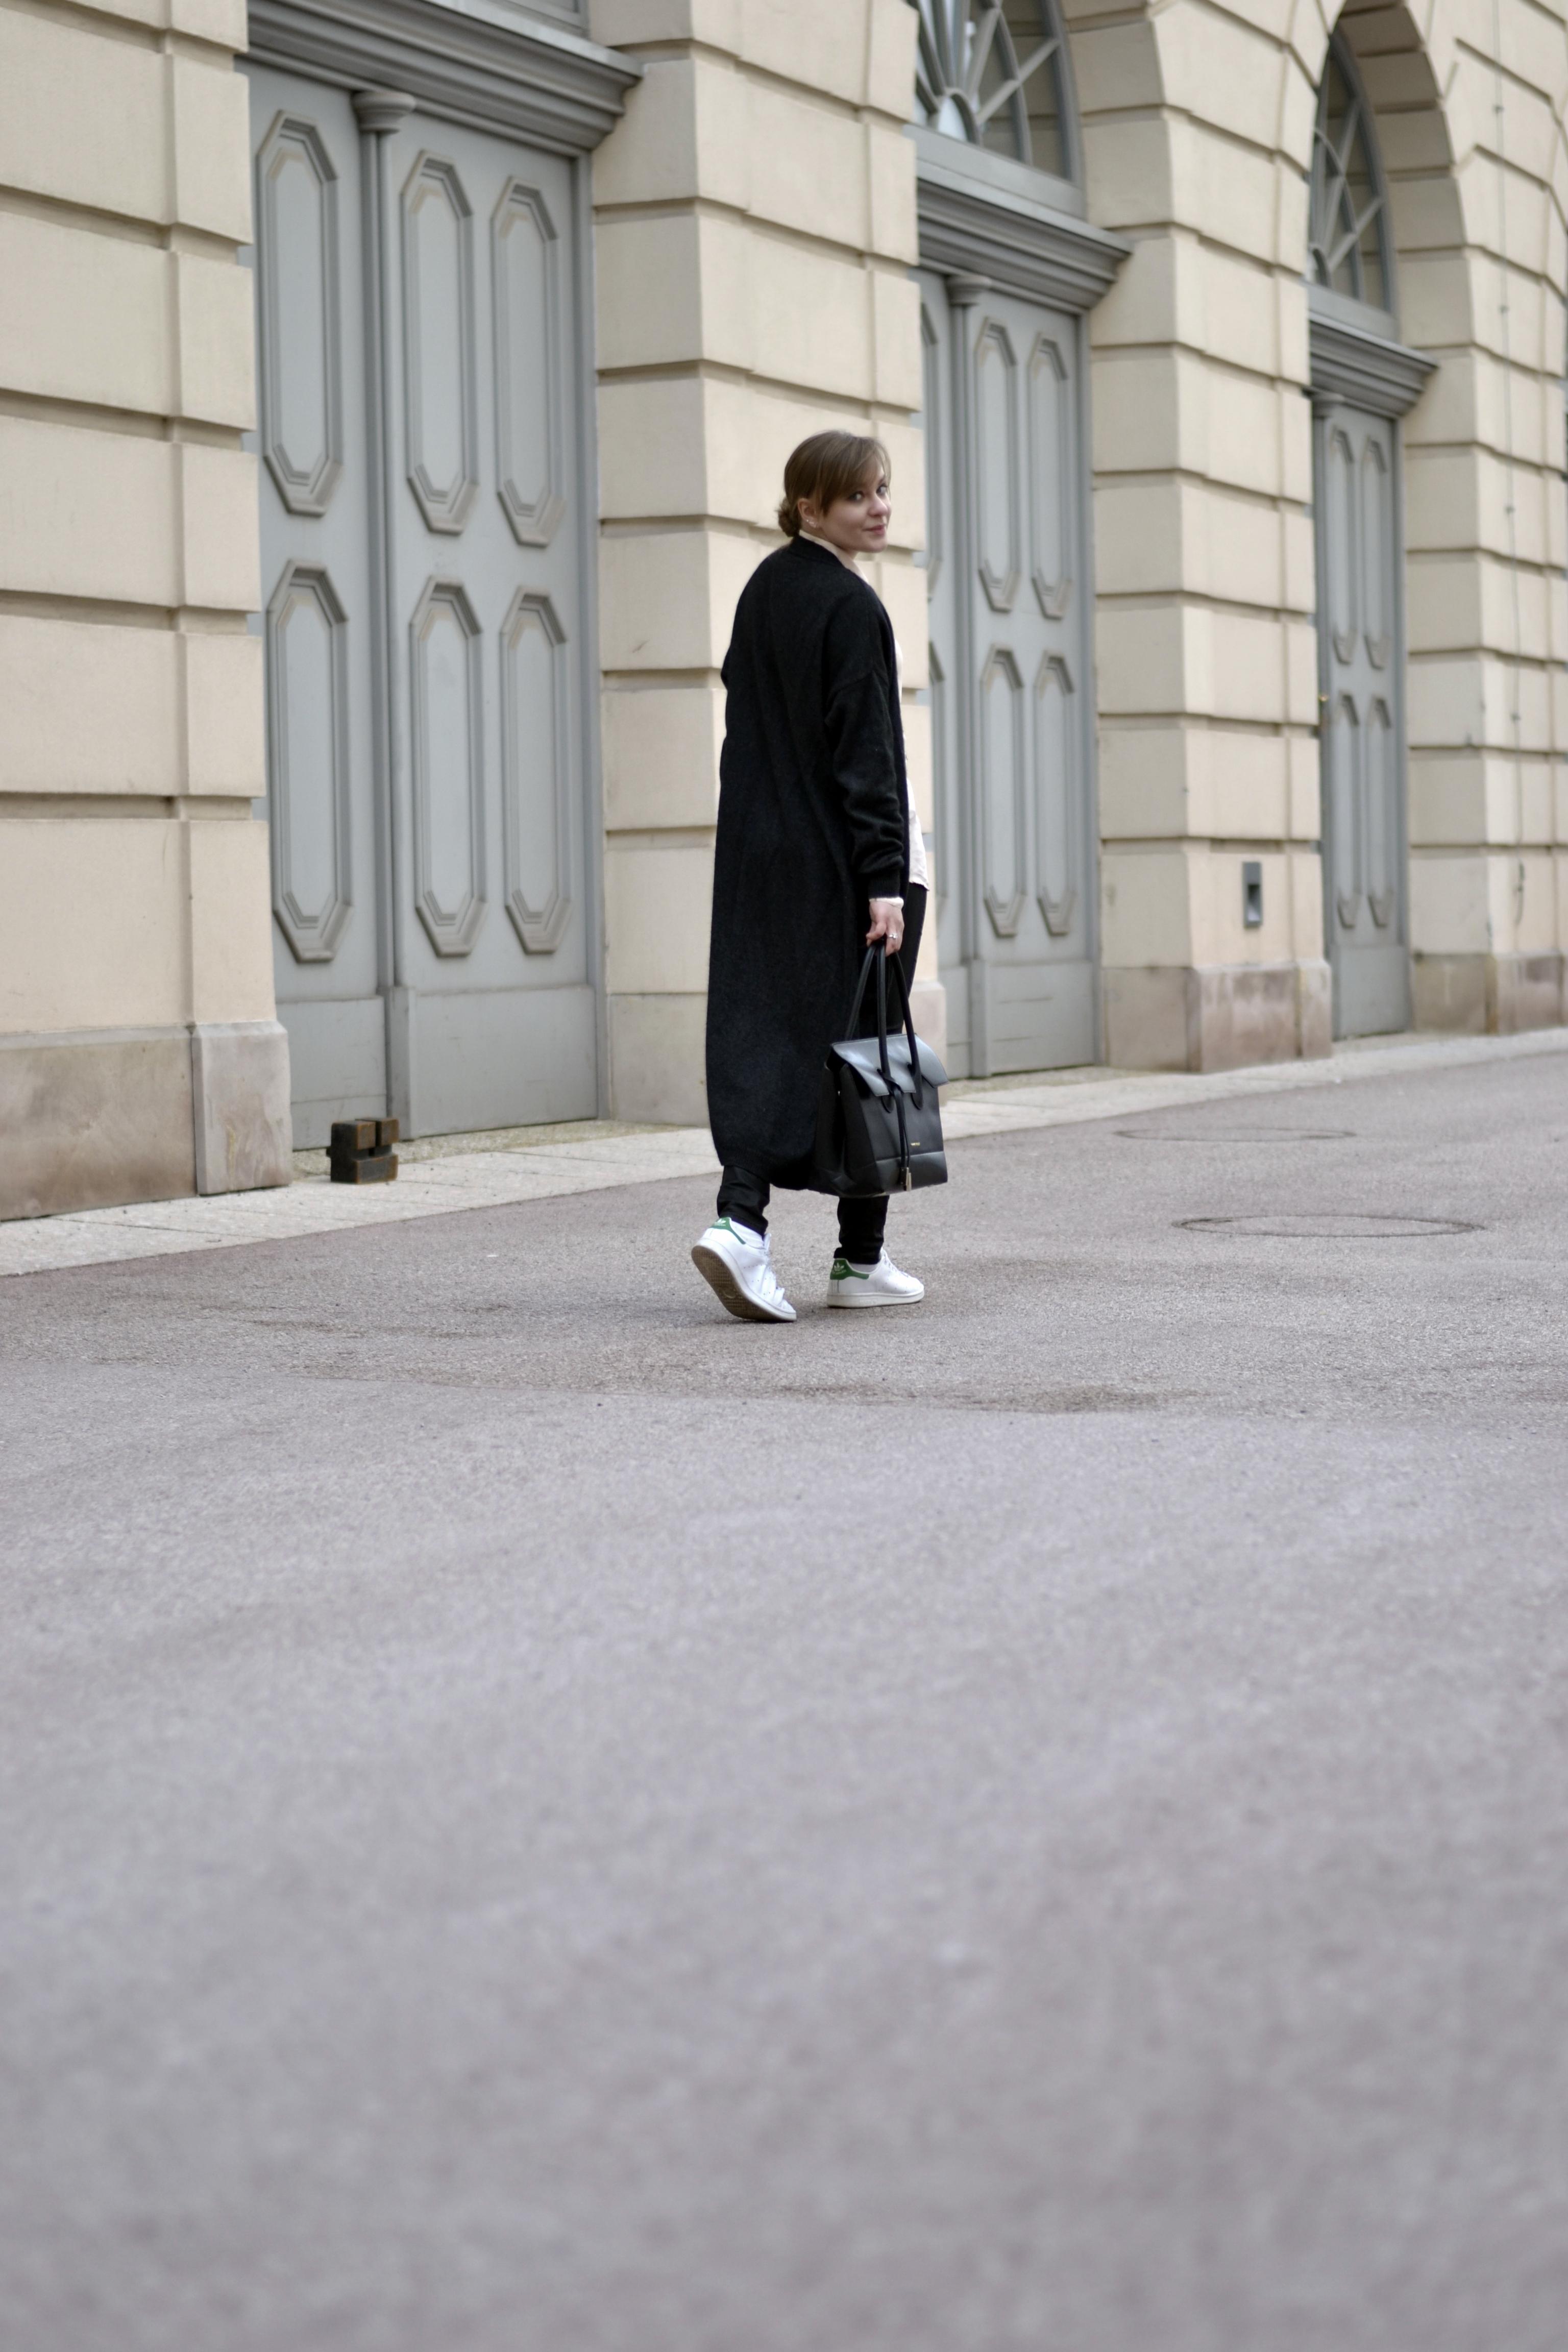 langer cardigan style sandbox fashion blog style outfit streetstyle mode oversized bluse weekday selected femme coccinelle shopper adidas stan smith wien vienna modeblog österreich austria fashion